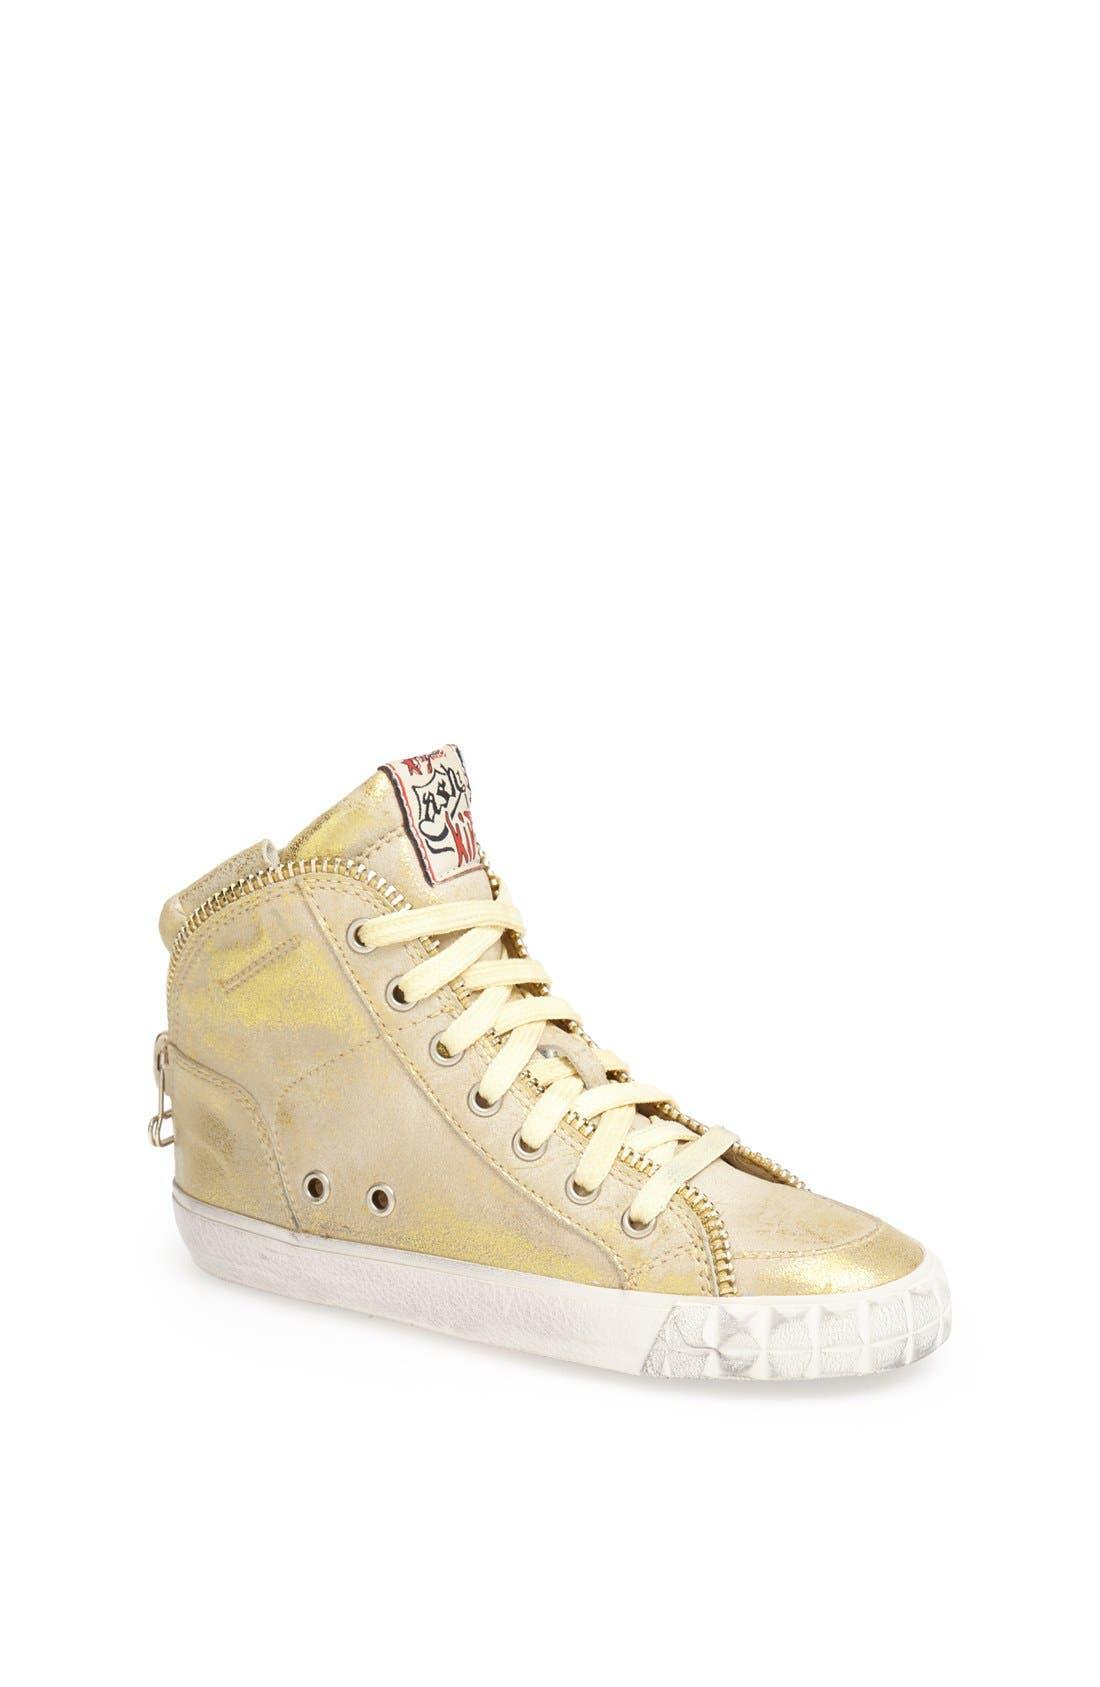 Main Image - Ash 'Candy' Sneaker (Little Kid & Big Kid)